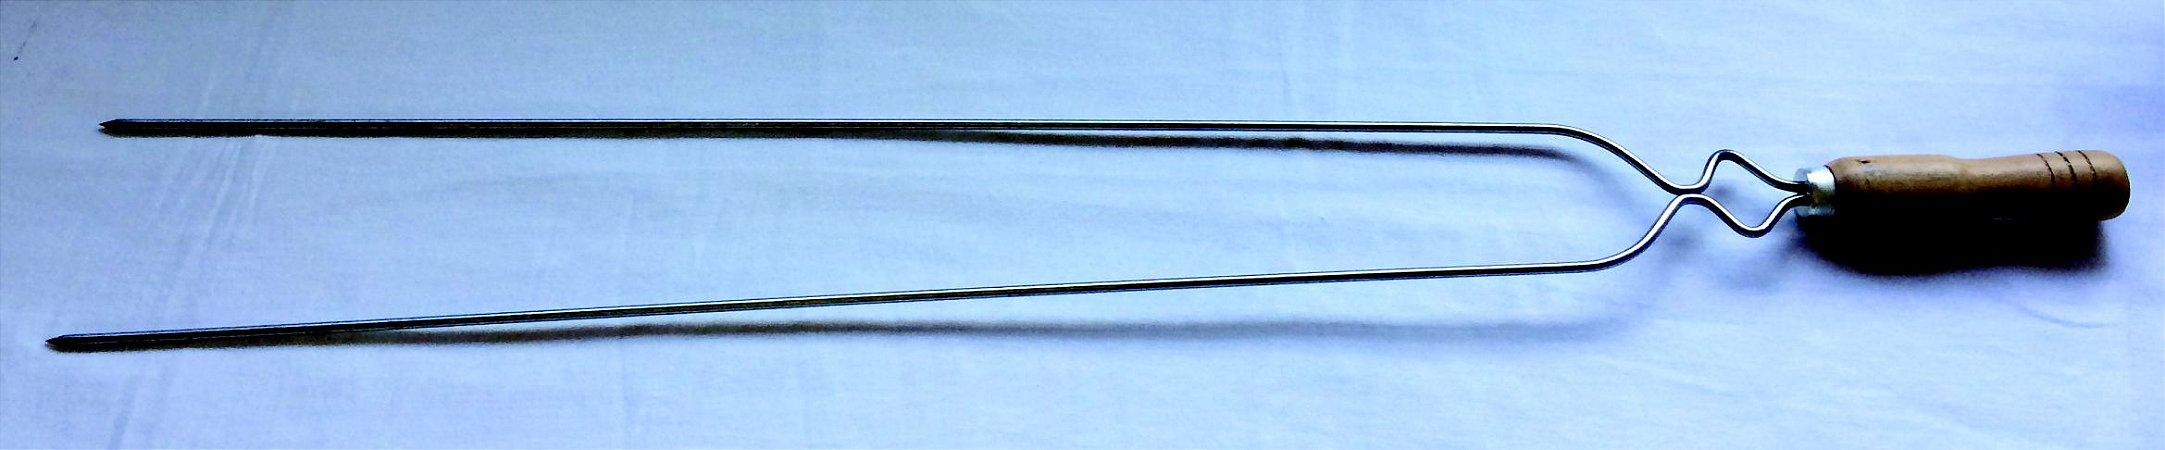 Espeto duplo 85 cm Inox